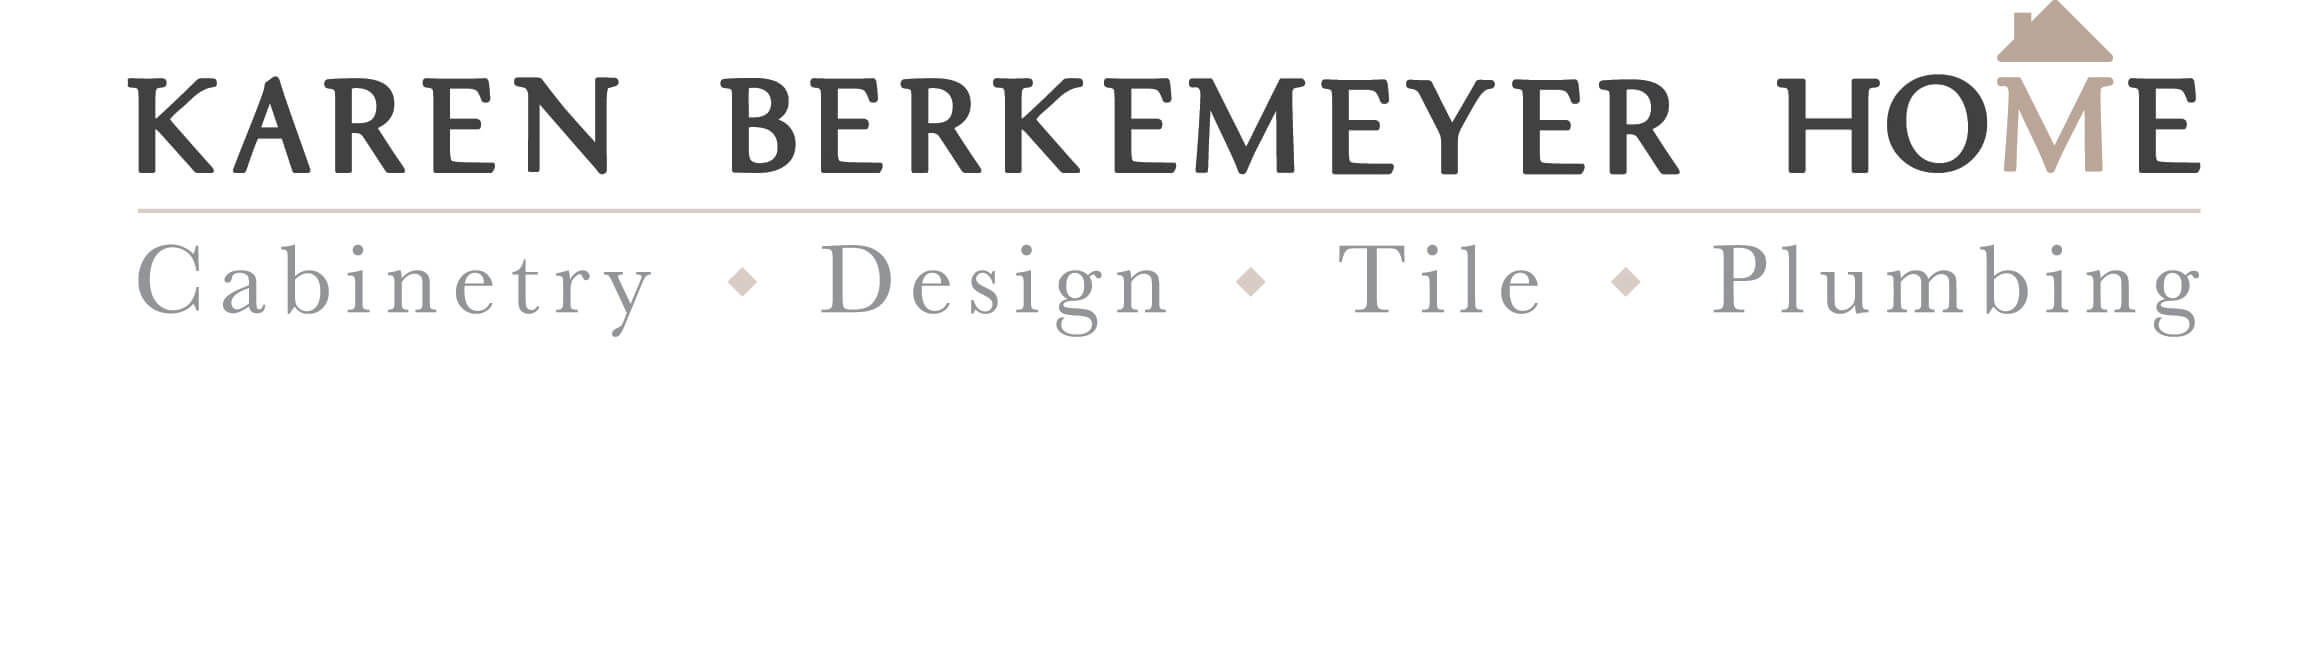 Karen Berkemeyer Home - Award Winning Kitchen & Bath Design Studio